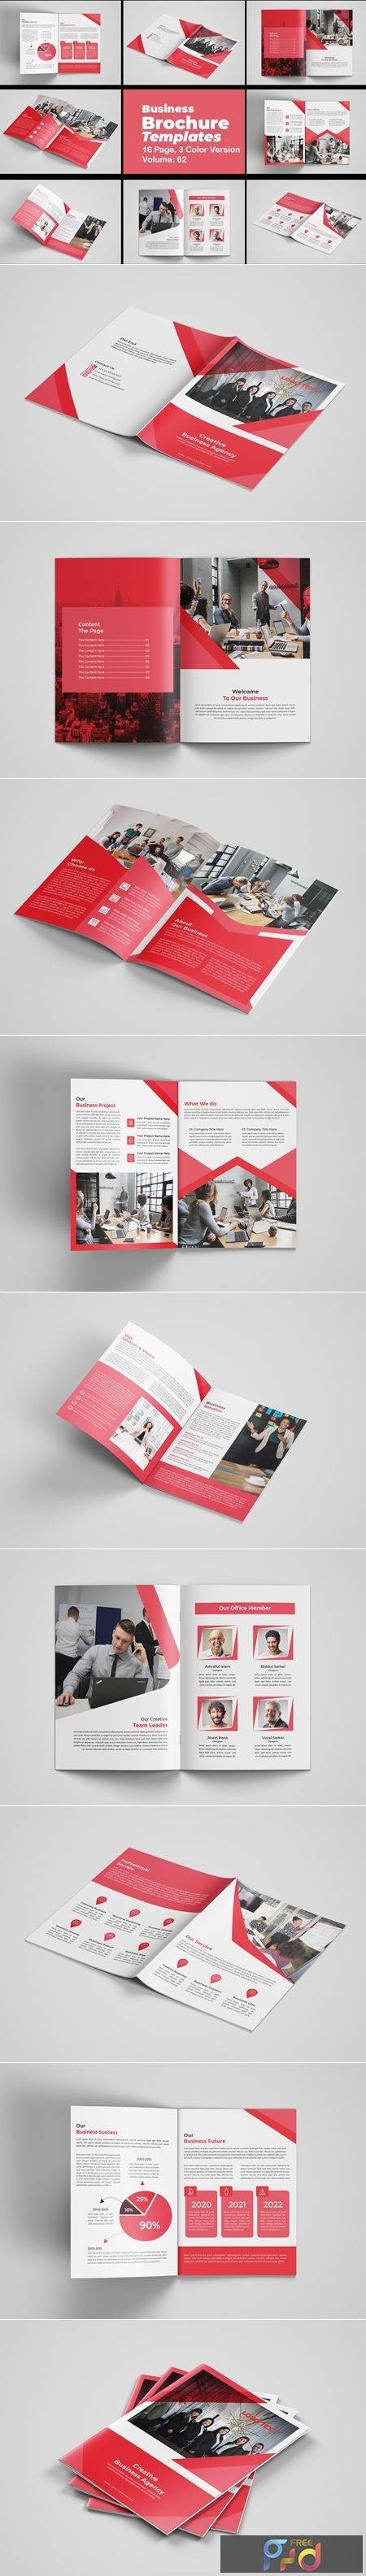 Brochure Template 4522219 1